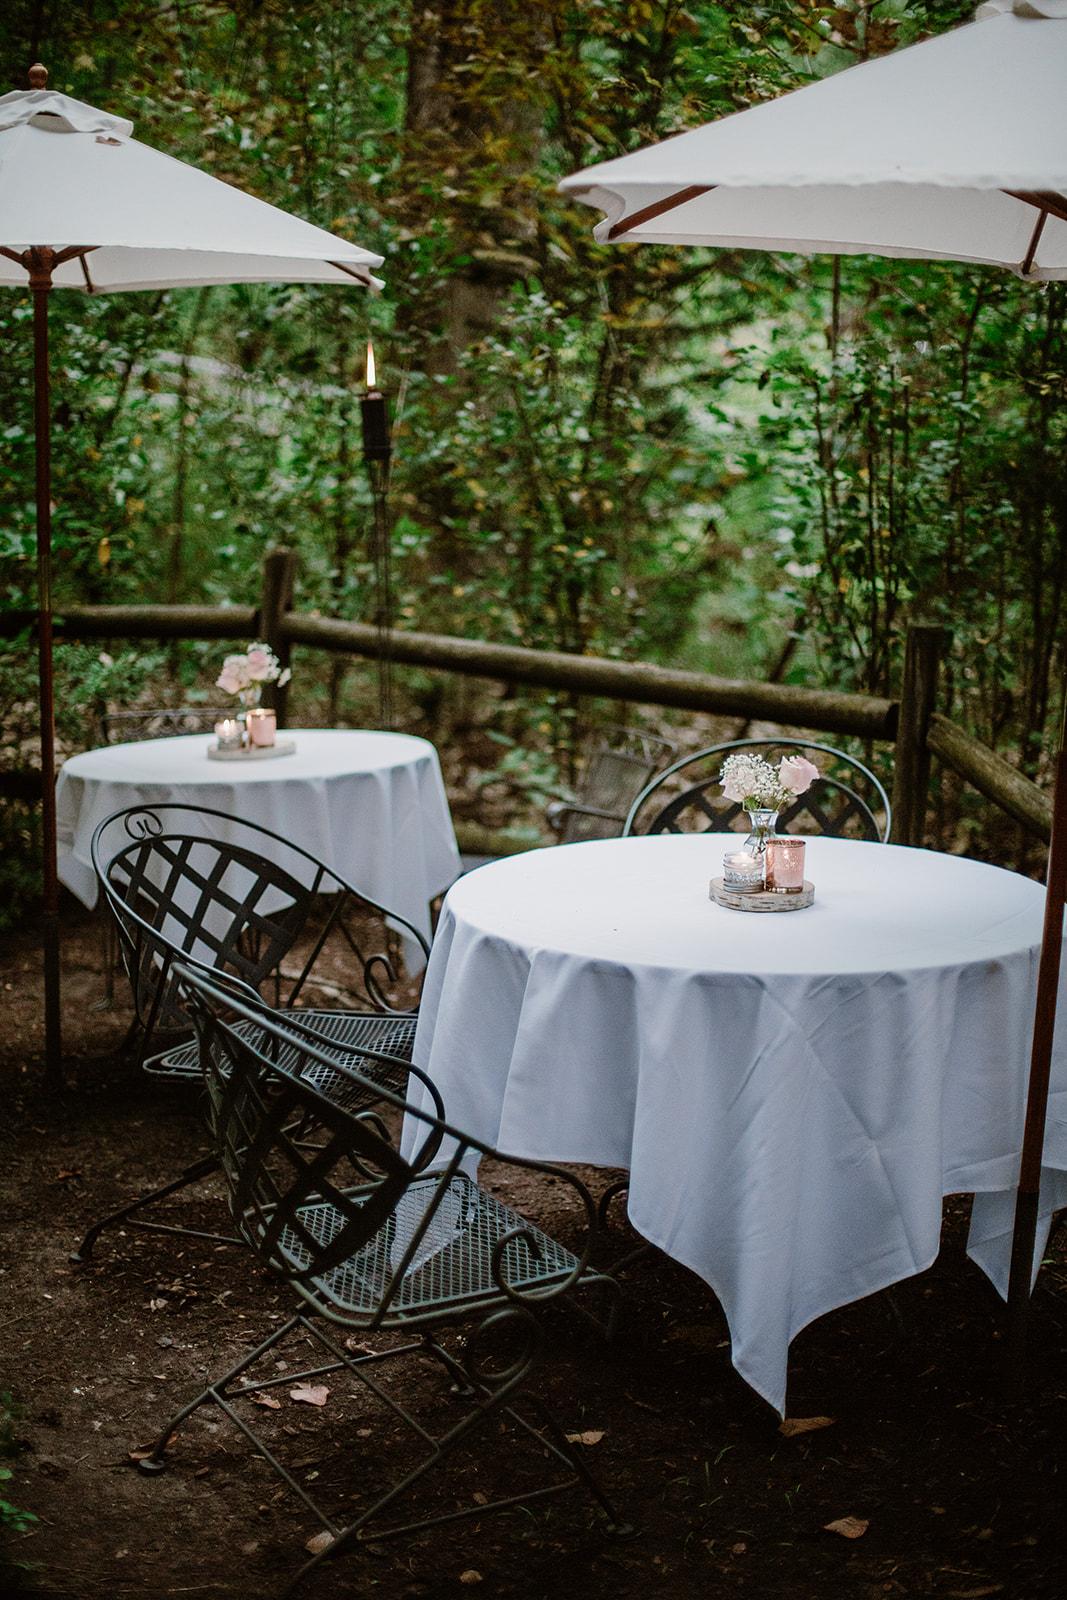 SarahMattozziPhotography-NicoleChris-GlenGardens-Reception-8.jpg